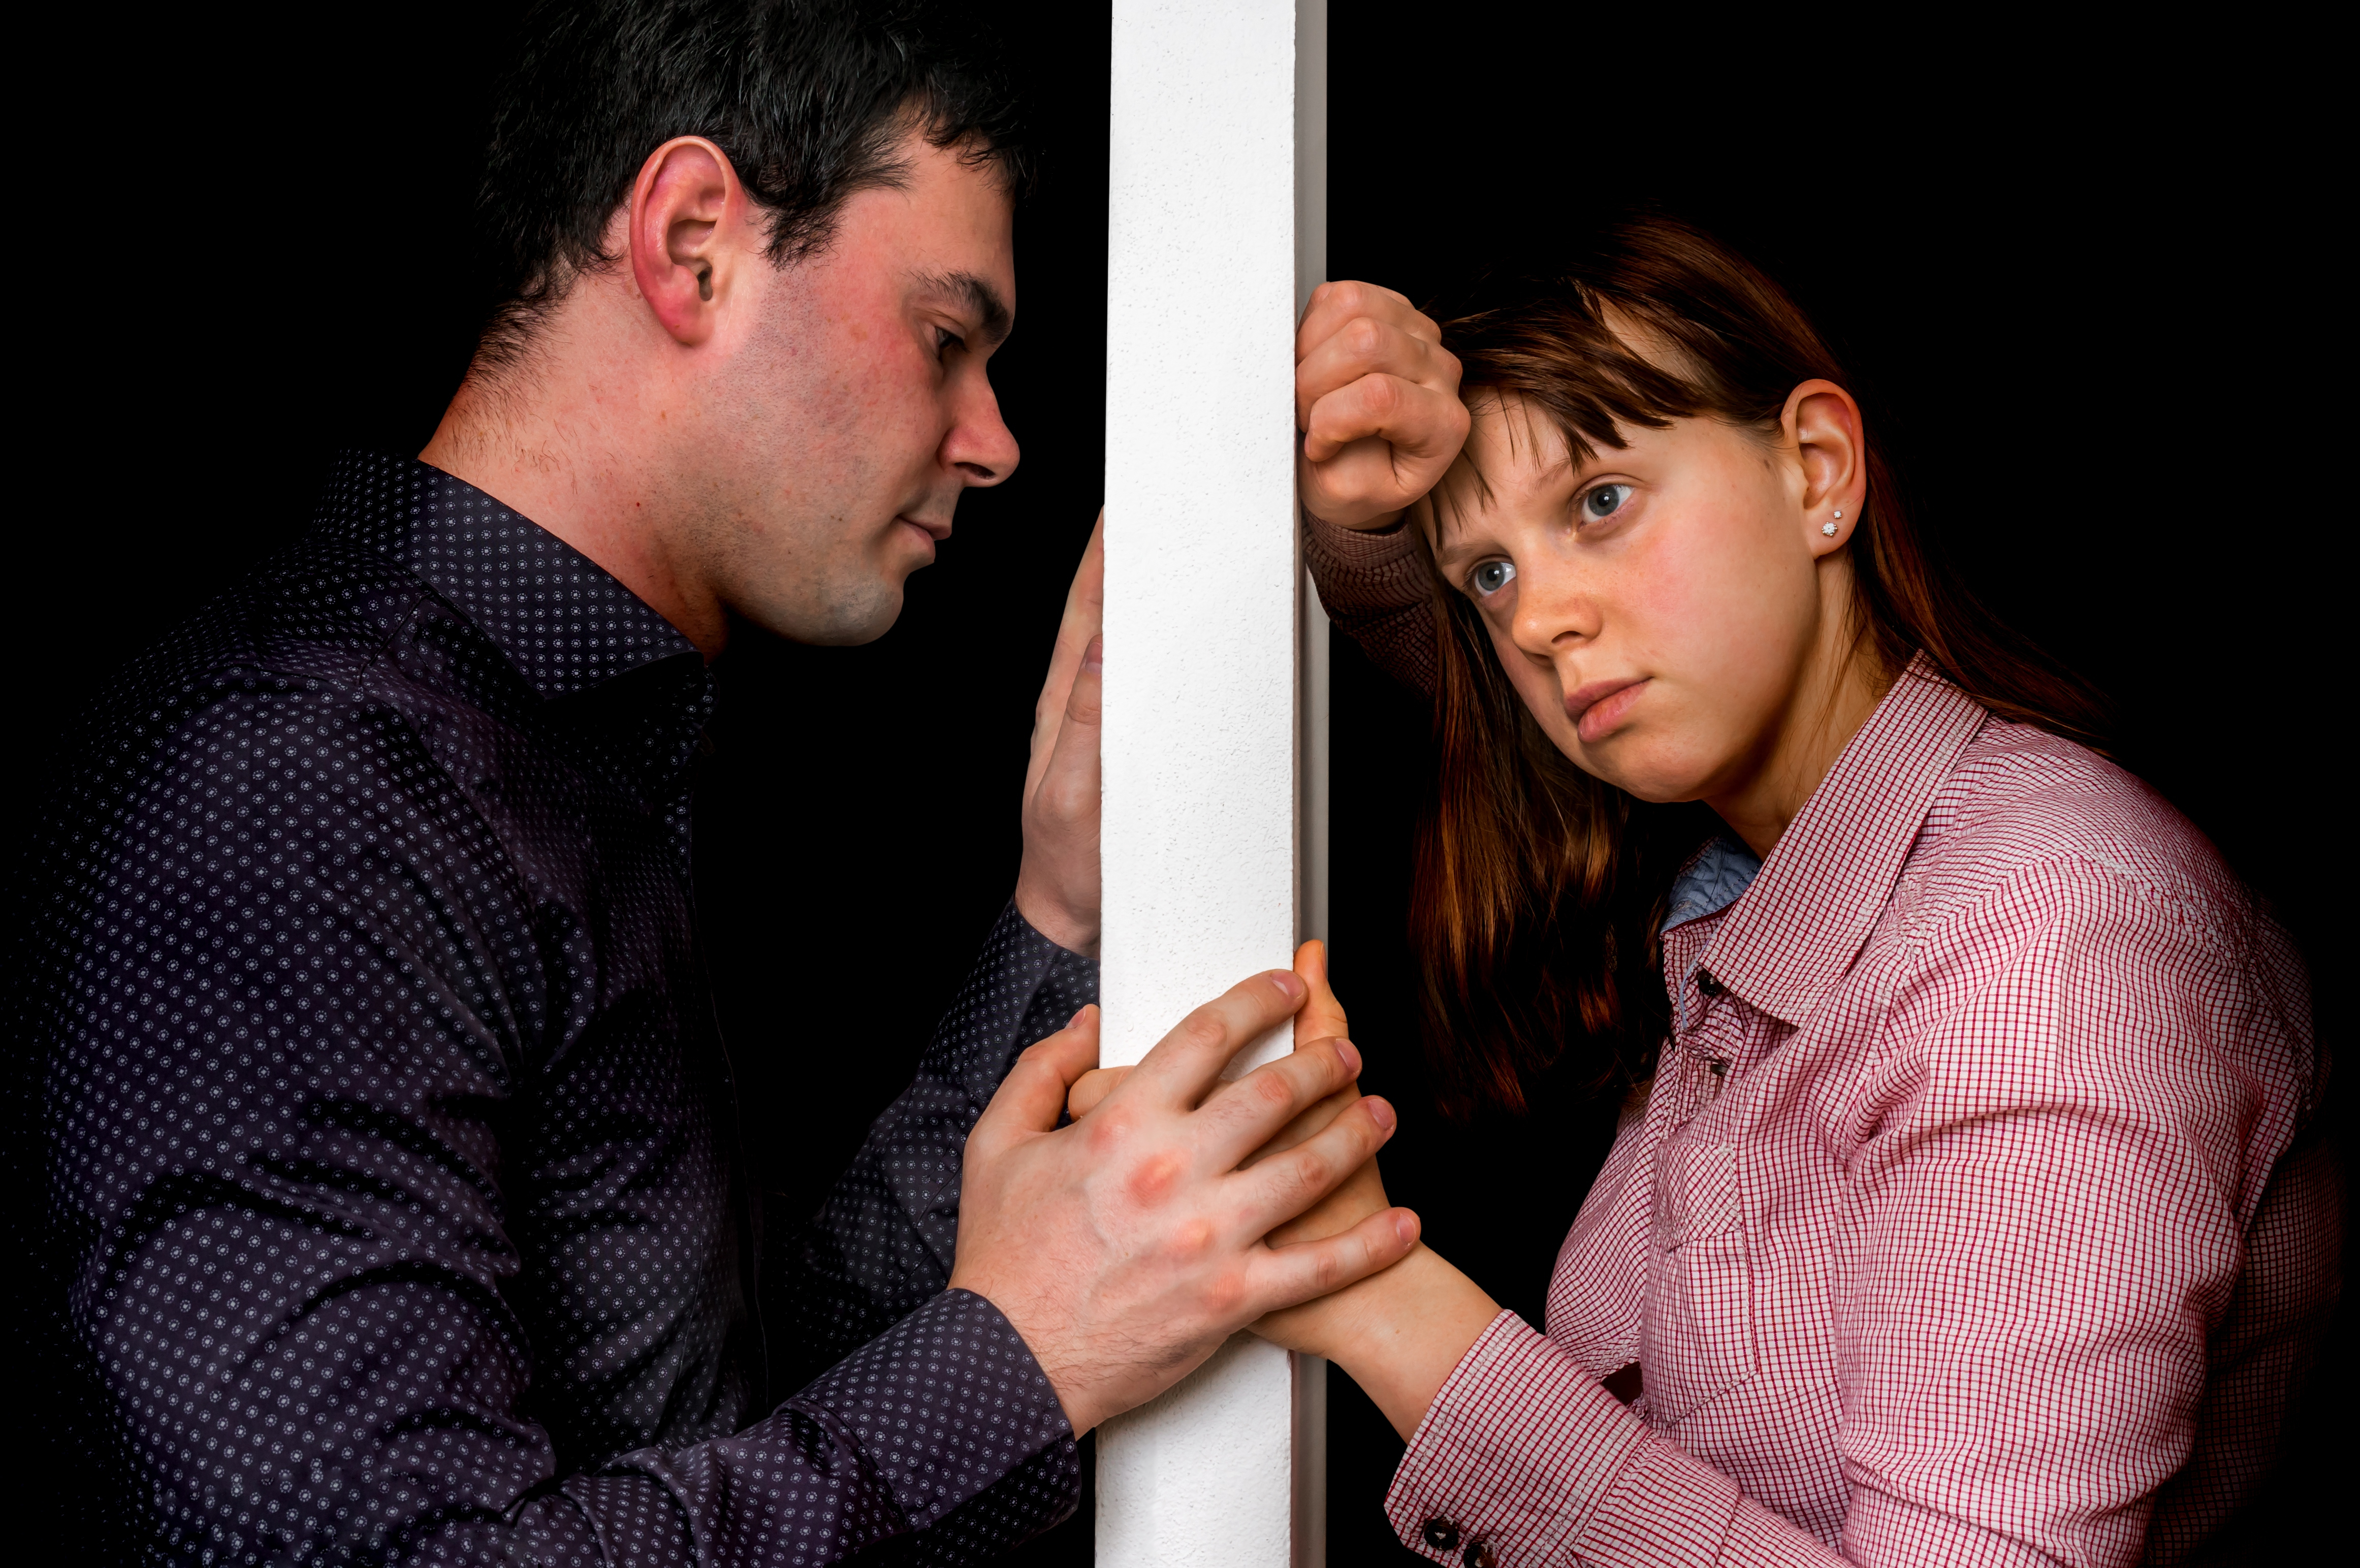 Matrimonio Catolico Infidelidad : Se debe perdonar la infidelidad en el matrimonio prensa